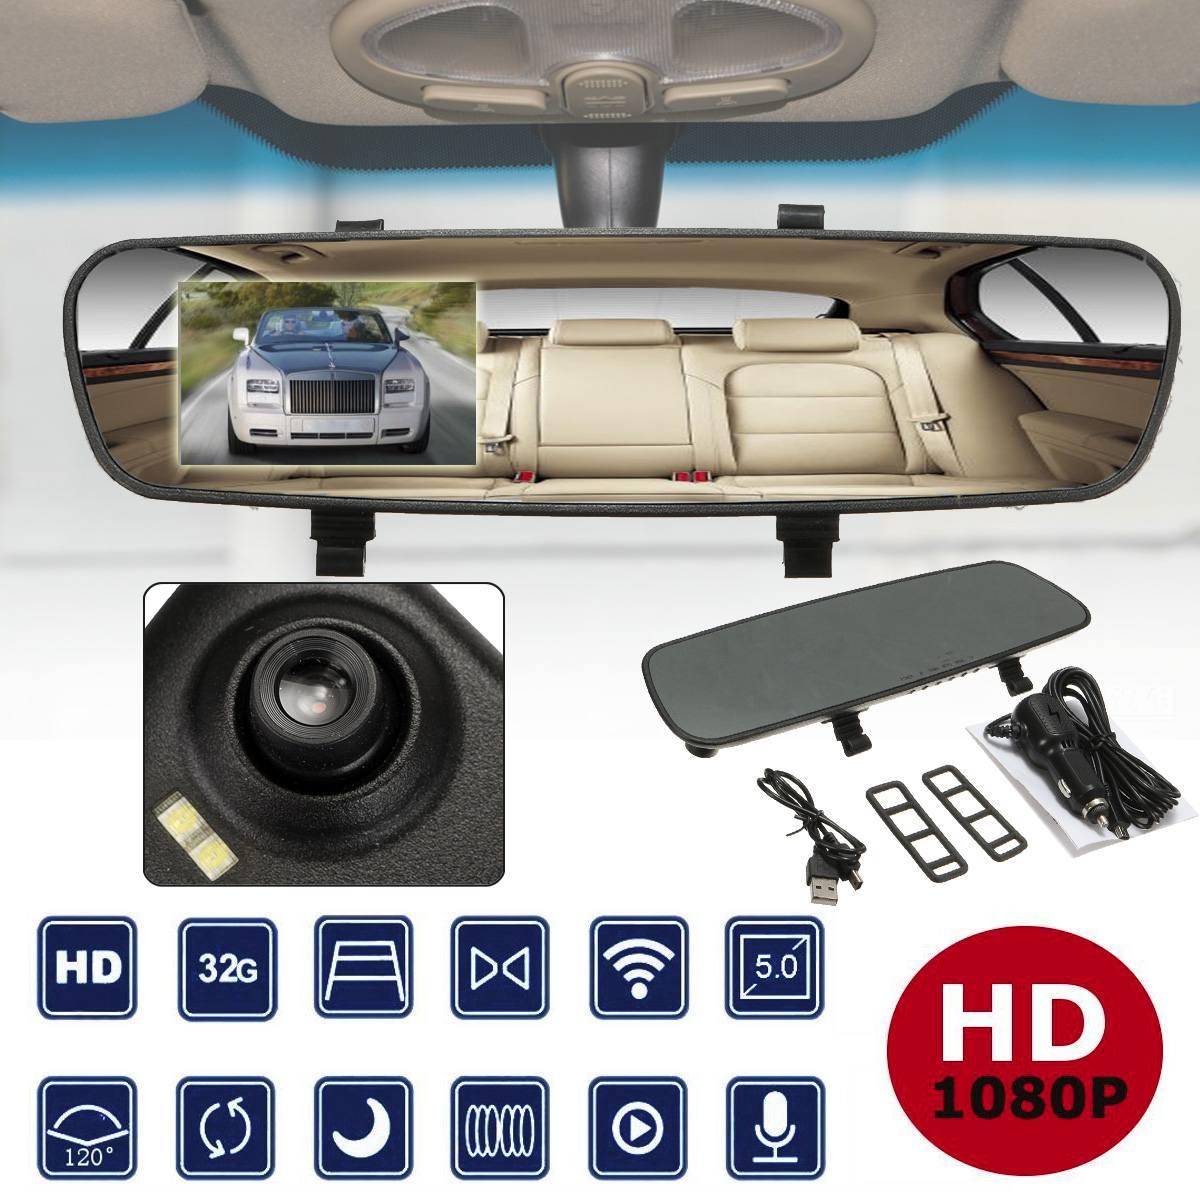 2.4'' 720P HD Rearview Smart Mirror Camera Monitor Dashboard Cam DVR Recorder 1